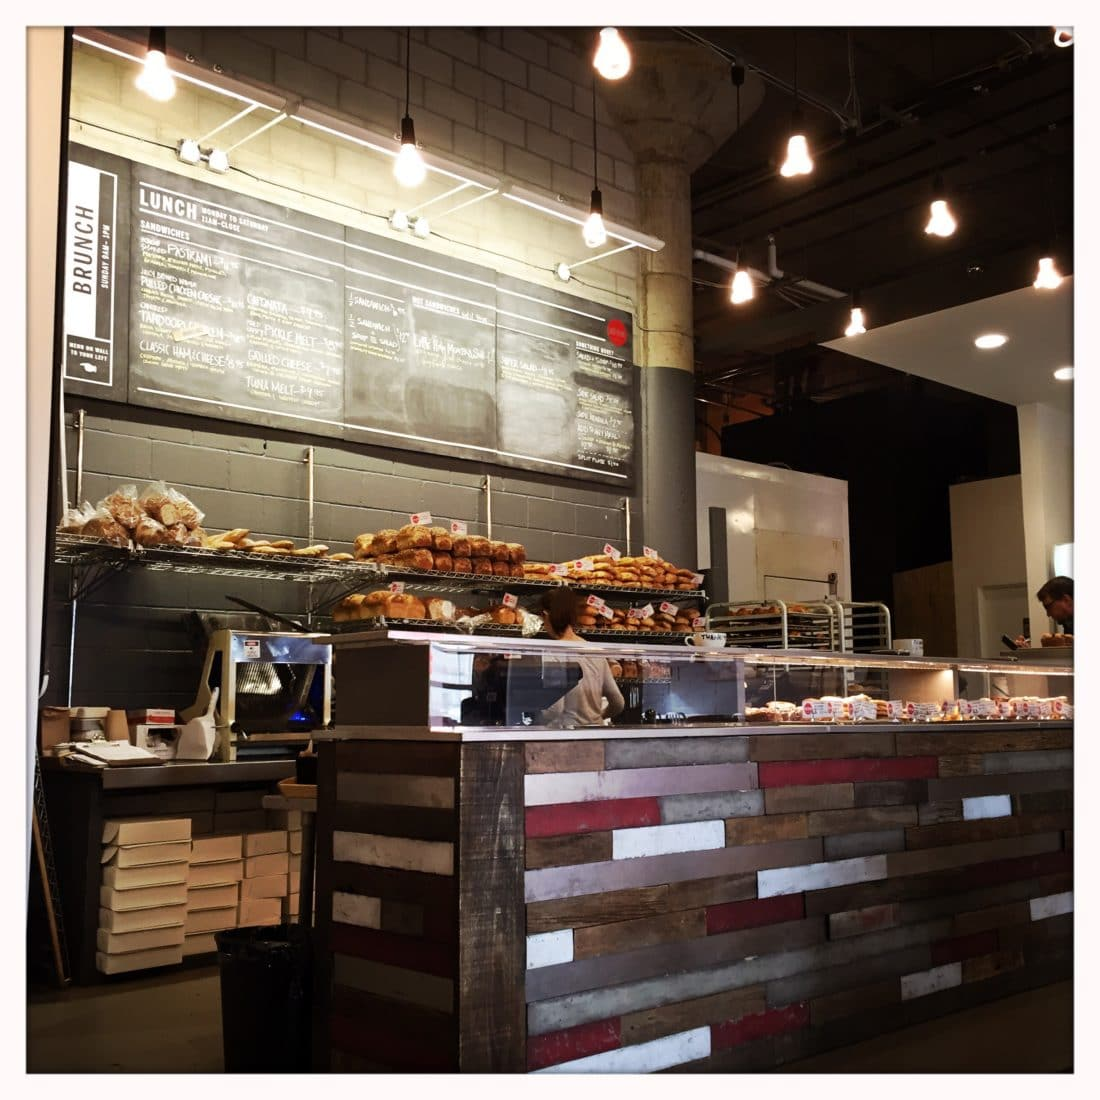 This is art bakery Ottawa